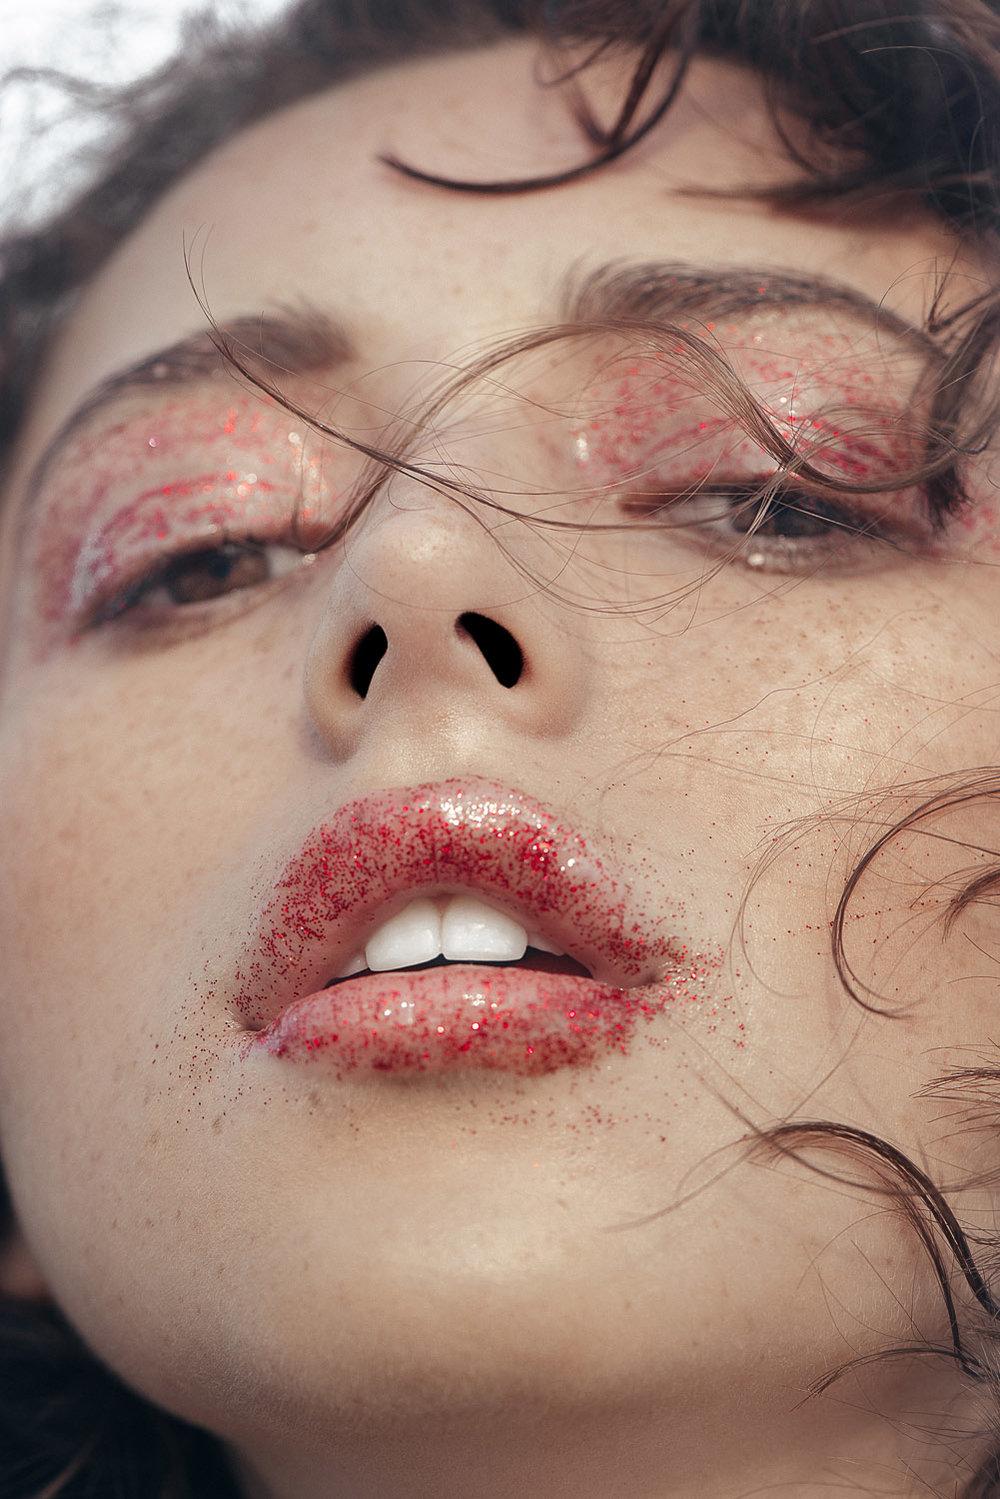 By Nastia Cloutier-Ignatiev @nastia.jpg-6.jpg